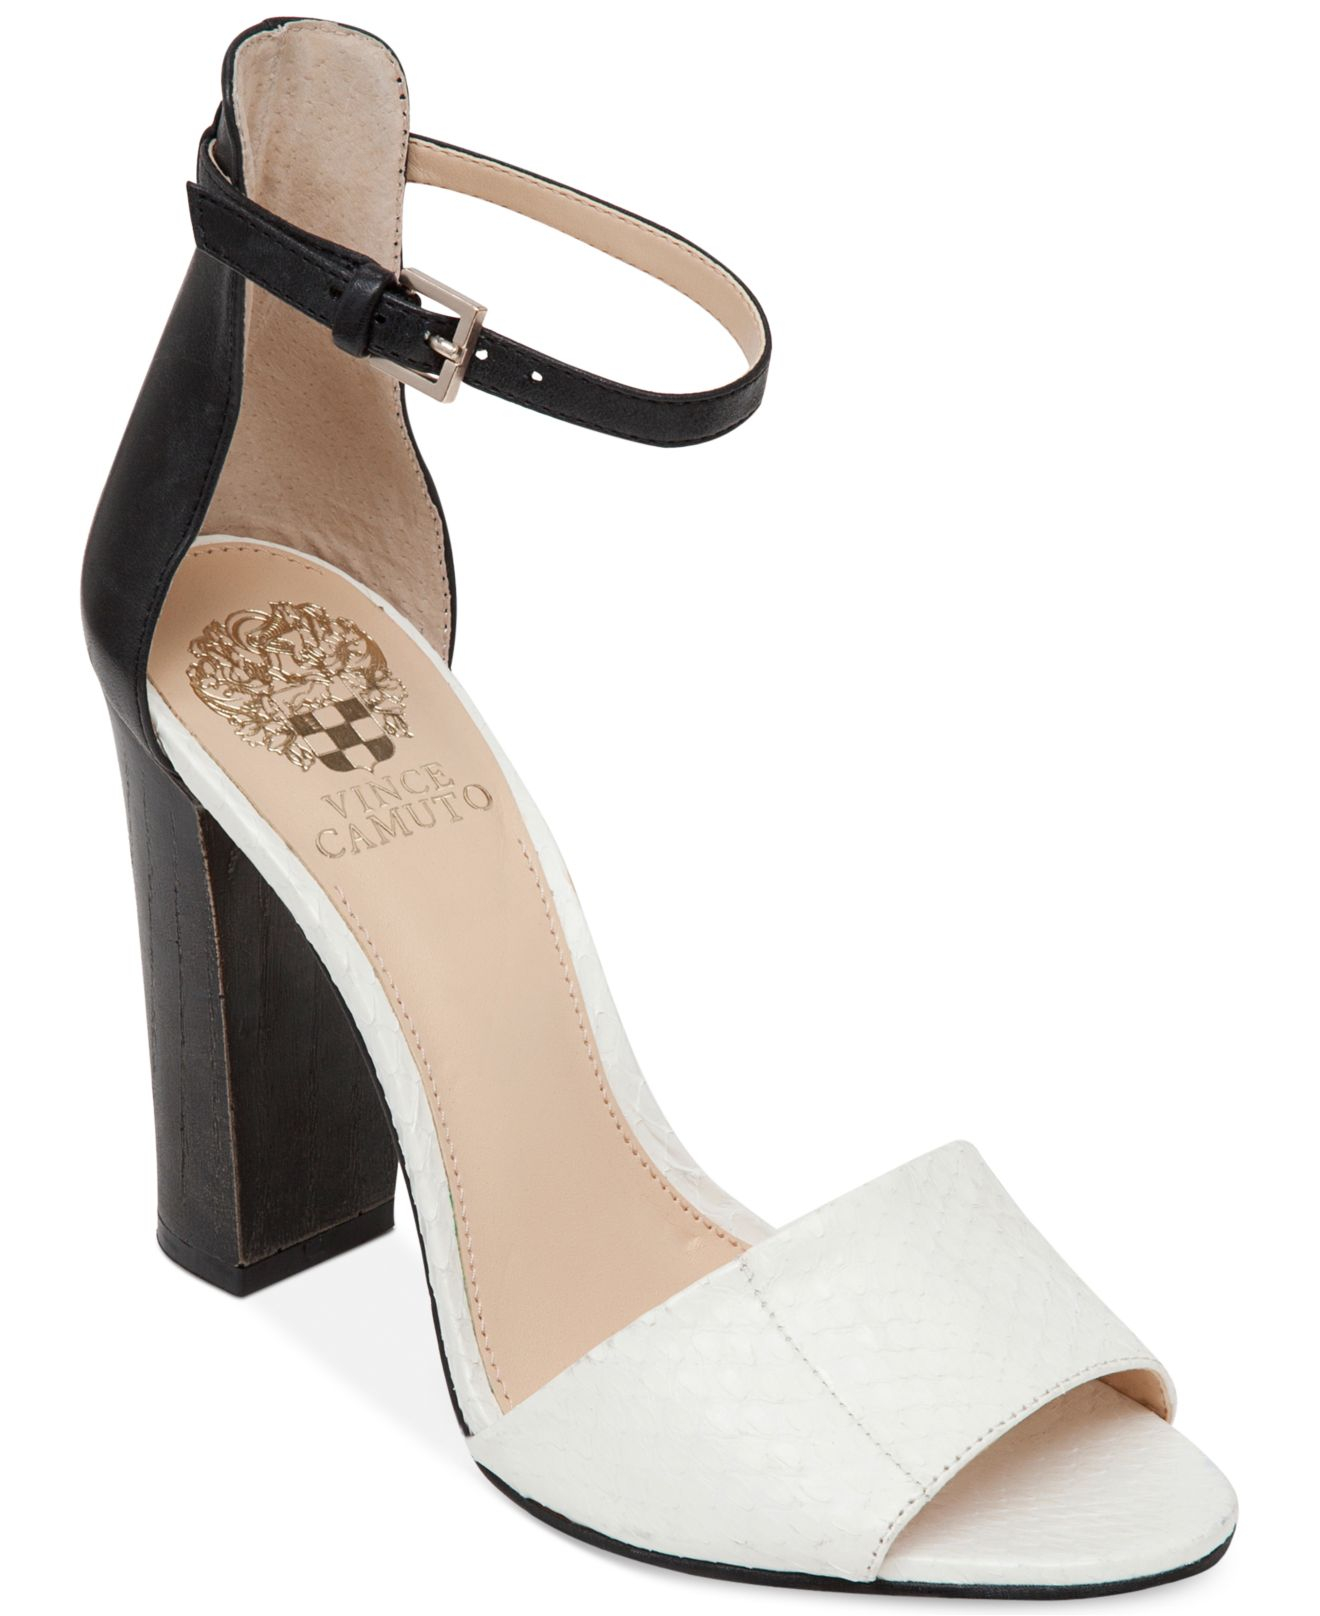 Vince Camuto Velenza Block Heel Ankle Strap Dress Sandals